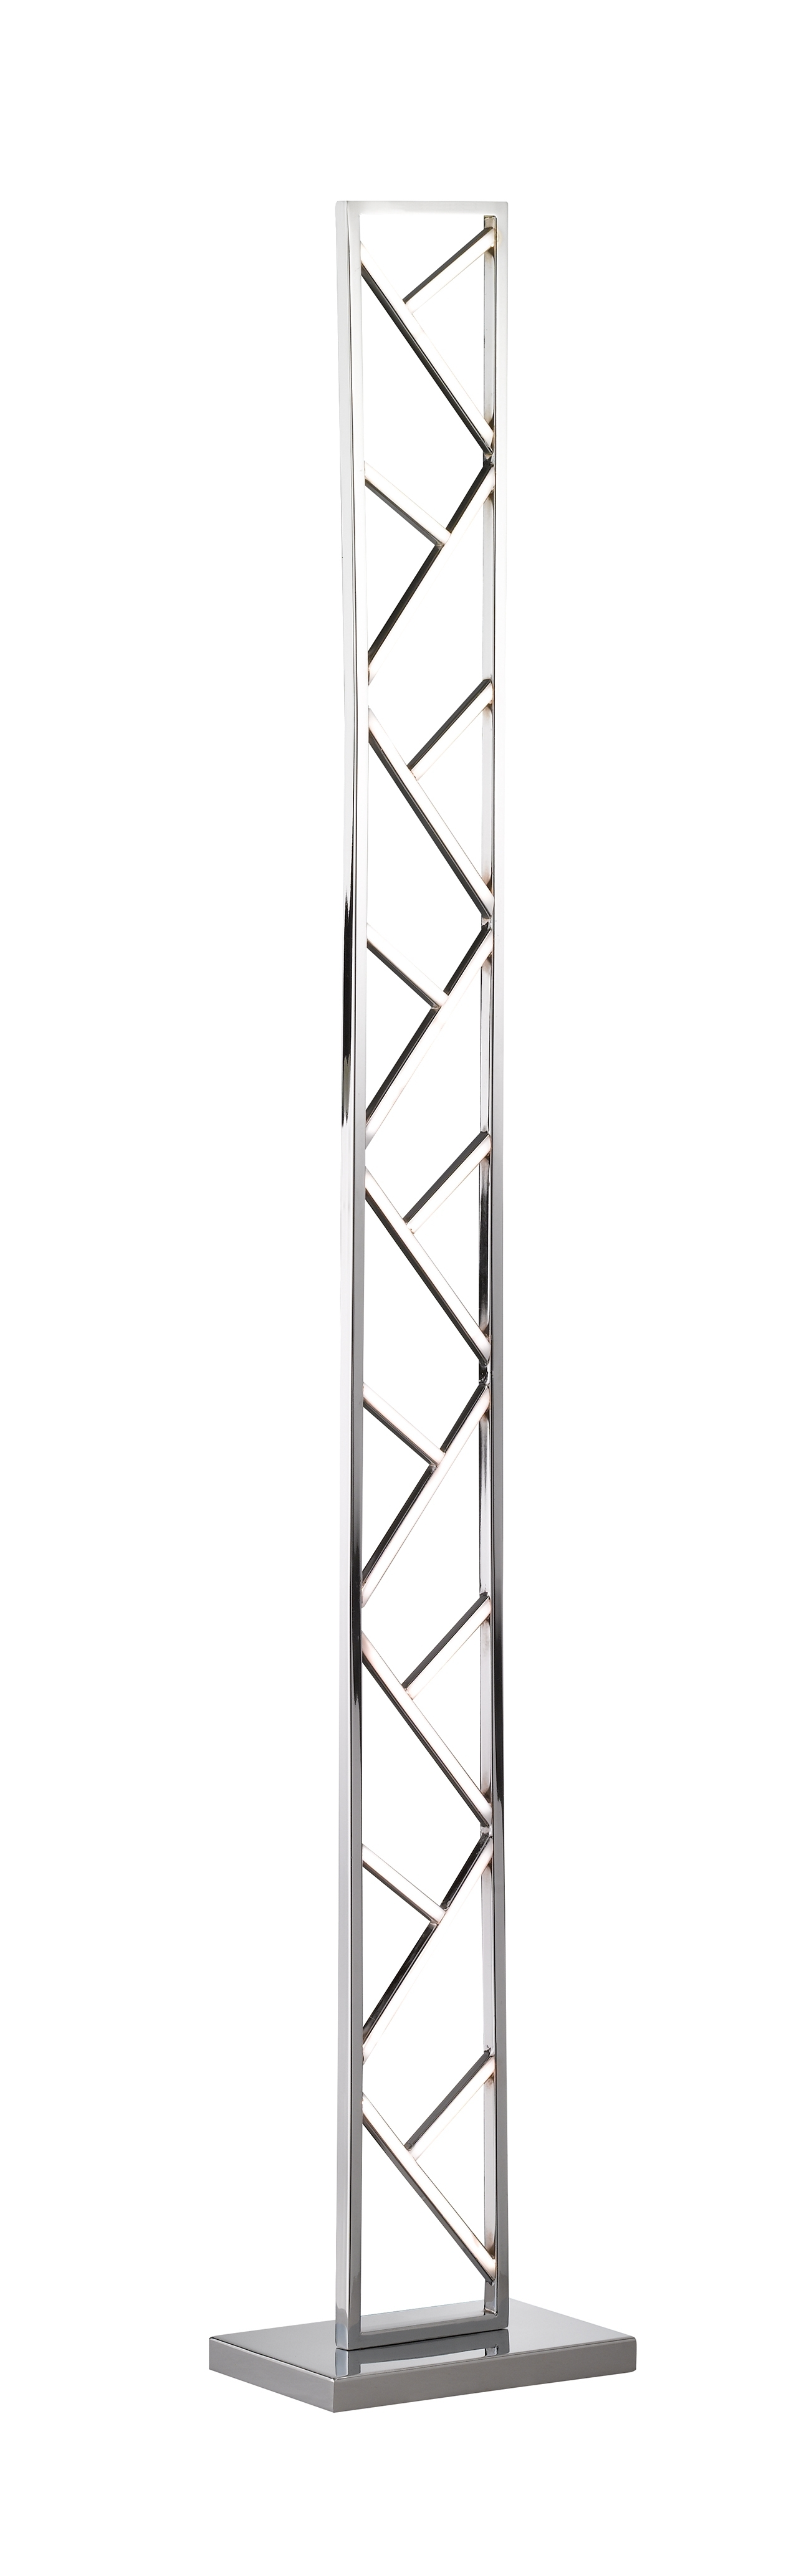 wofi-led-standleuchte-standleuchte-fox-1-flammig-metallisch-3578-01-64-6000